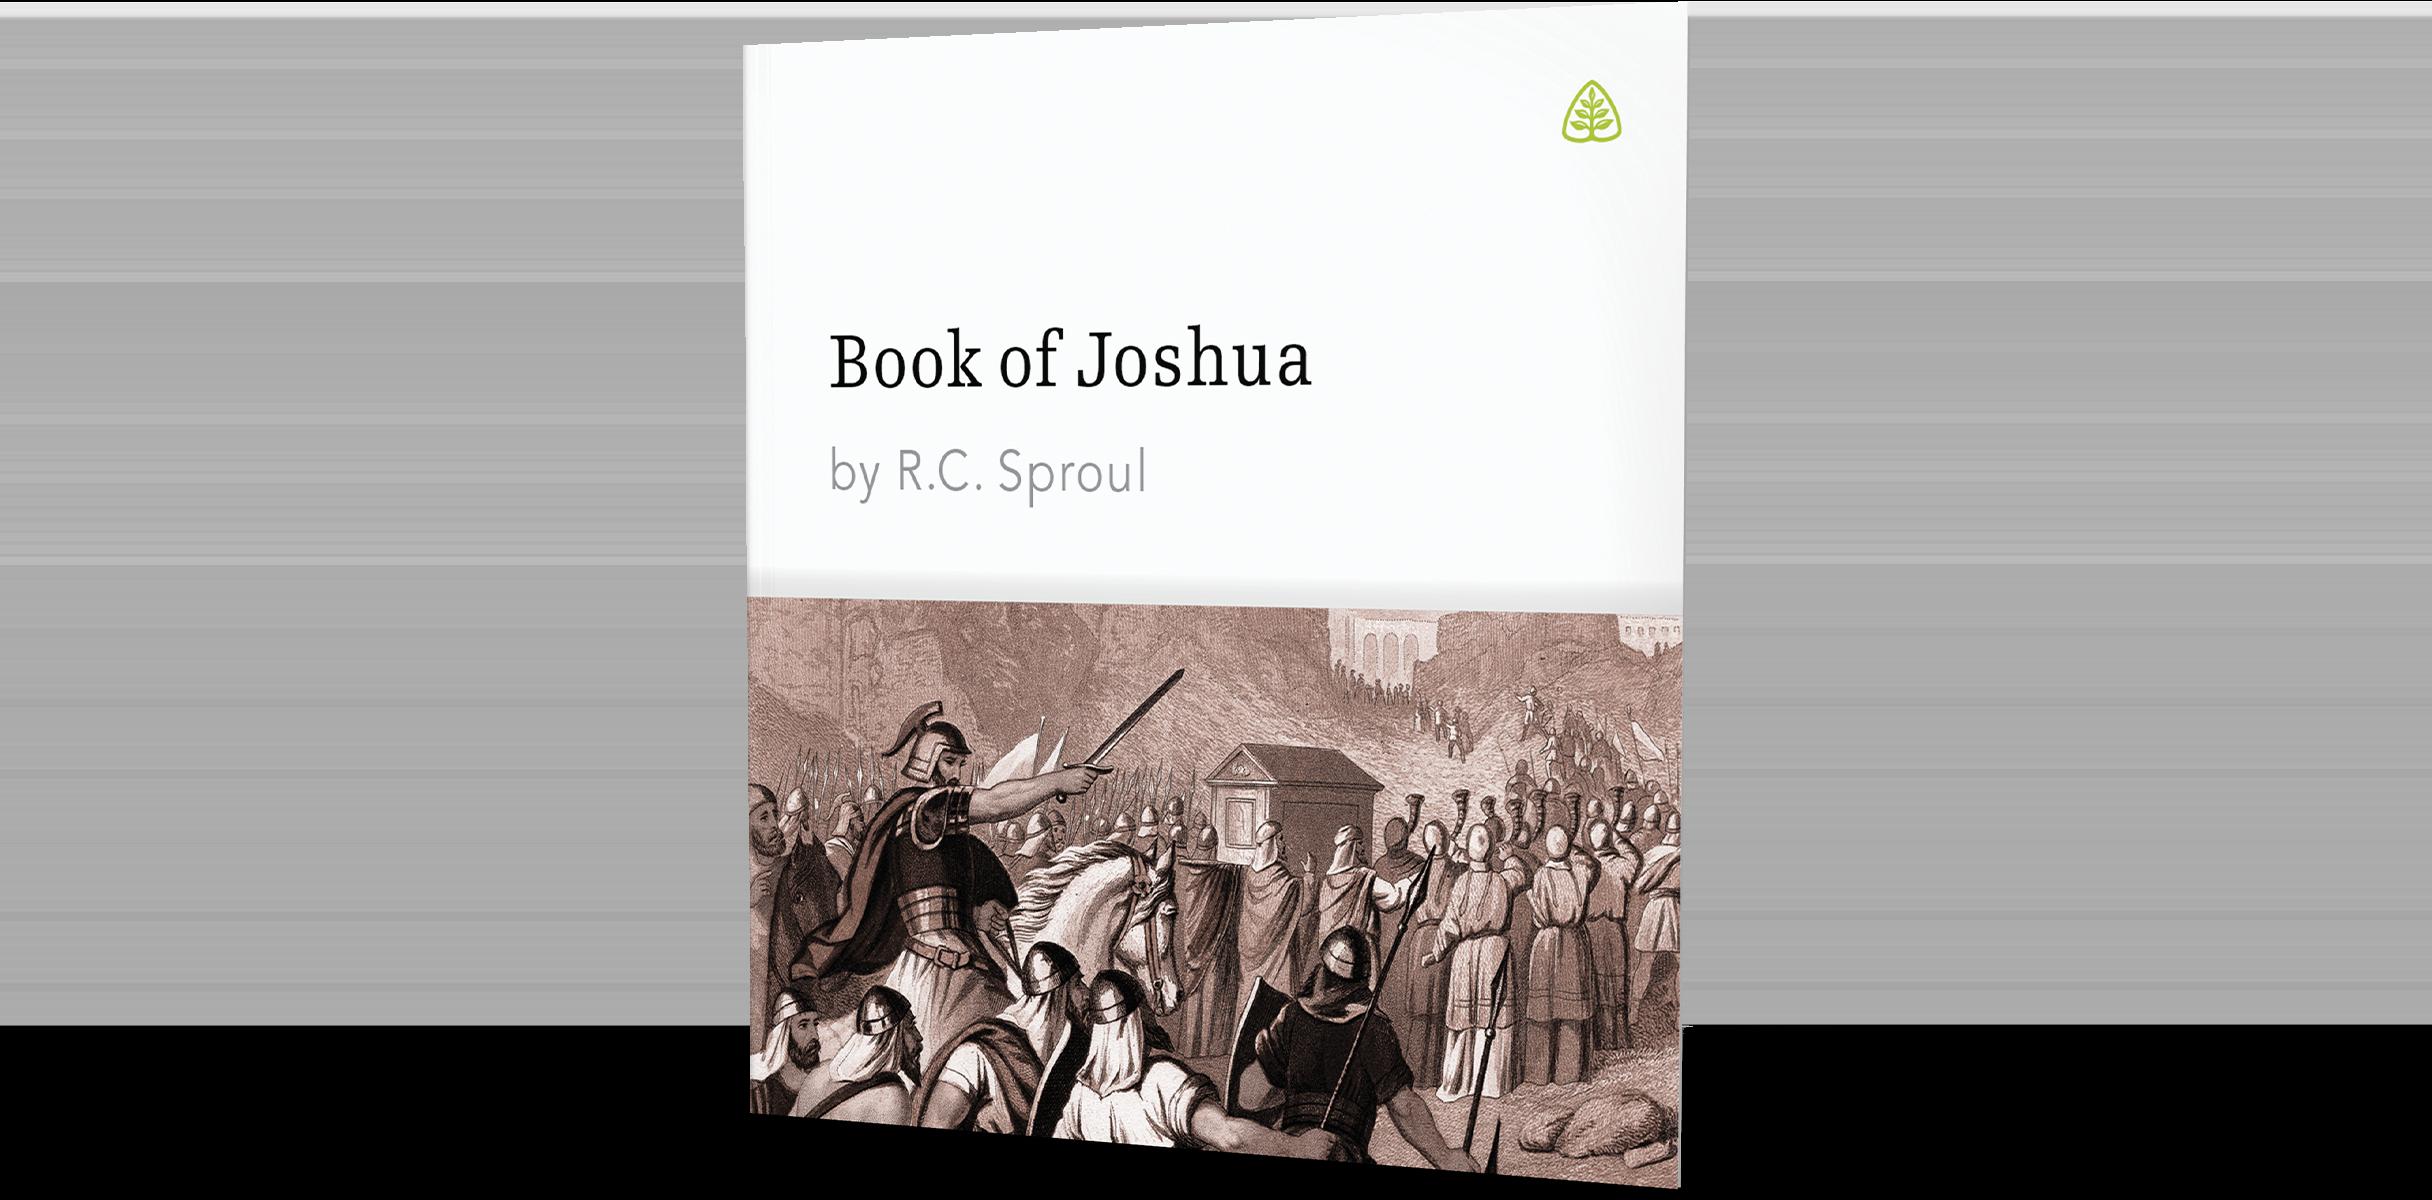 Book of Joshua